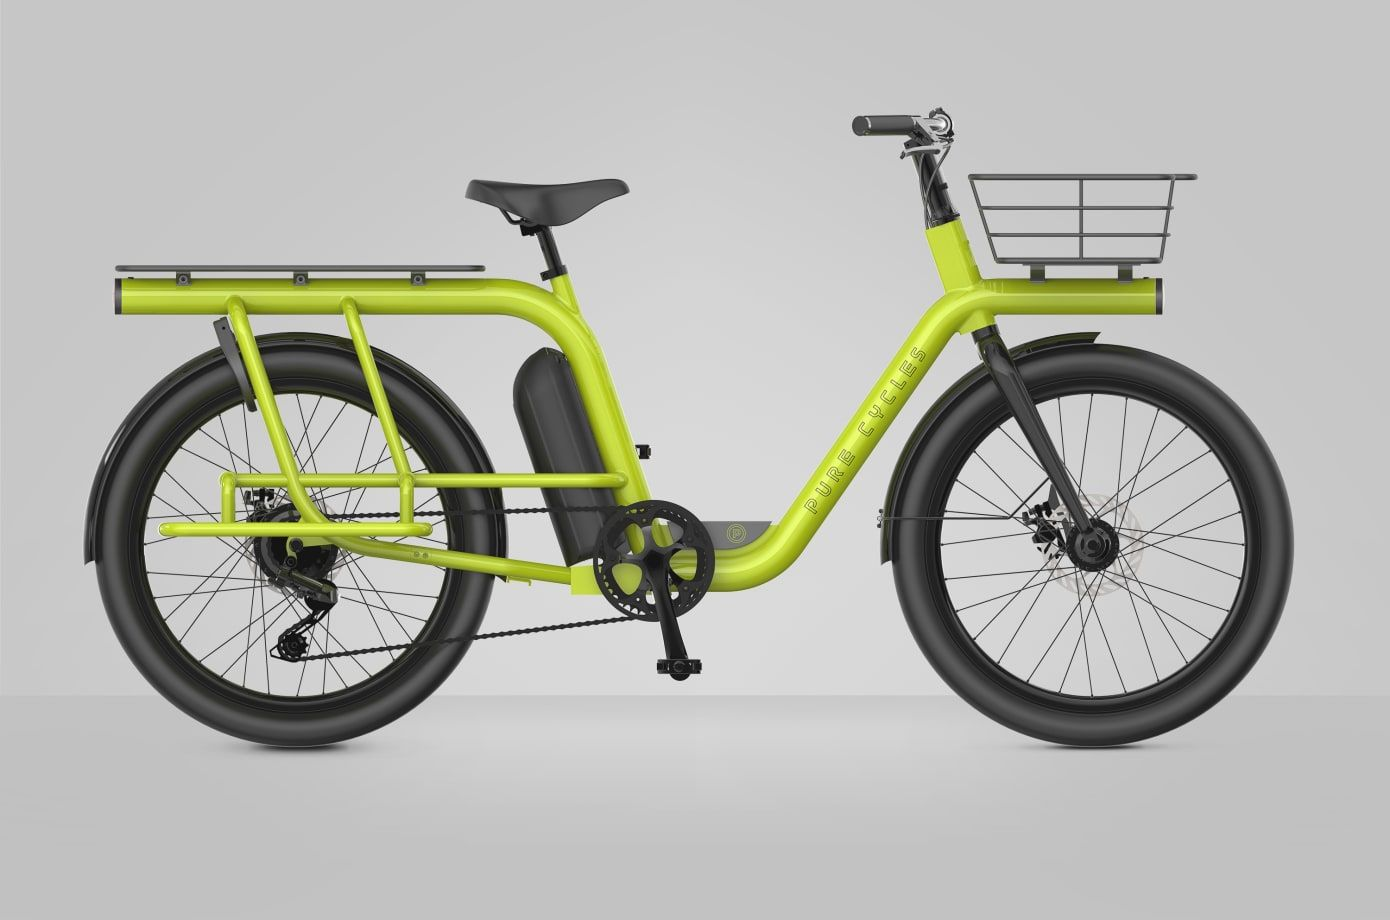 Capacita The Most Affordable Smart Cargo E Bike Indiegogo Electric Bike Cargo Bike Electric Cargo Bike